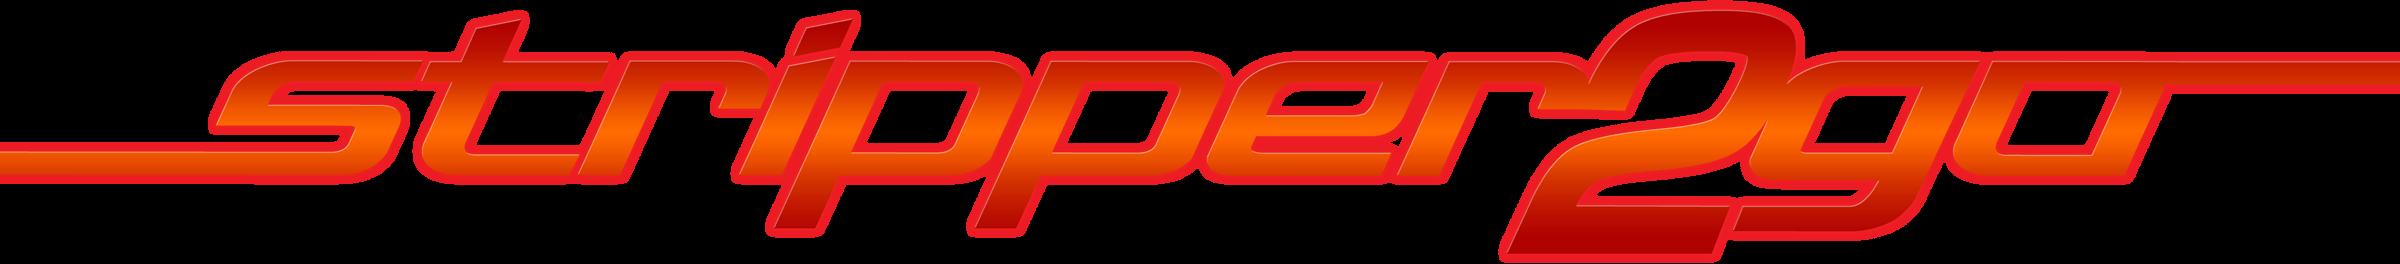 Stripper2go logo